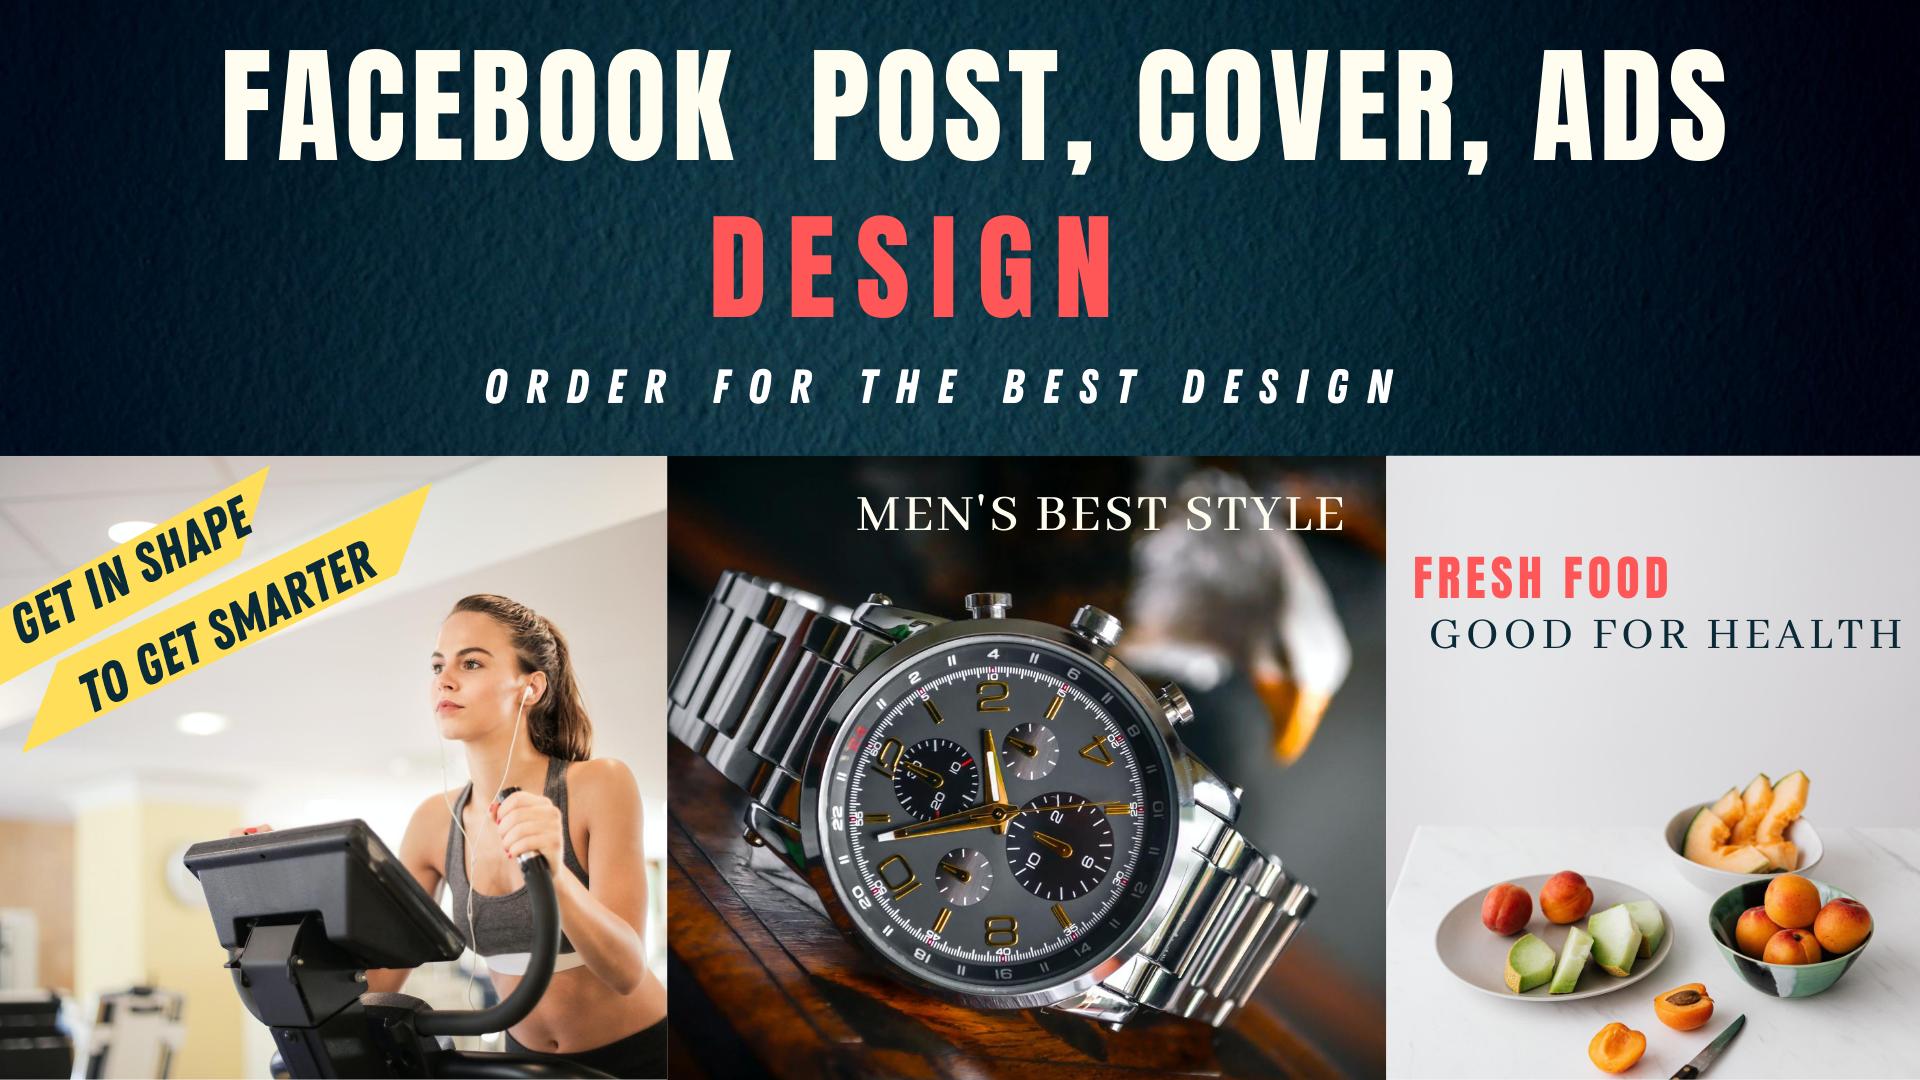 I will design facebook Instagram post cover ads